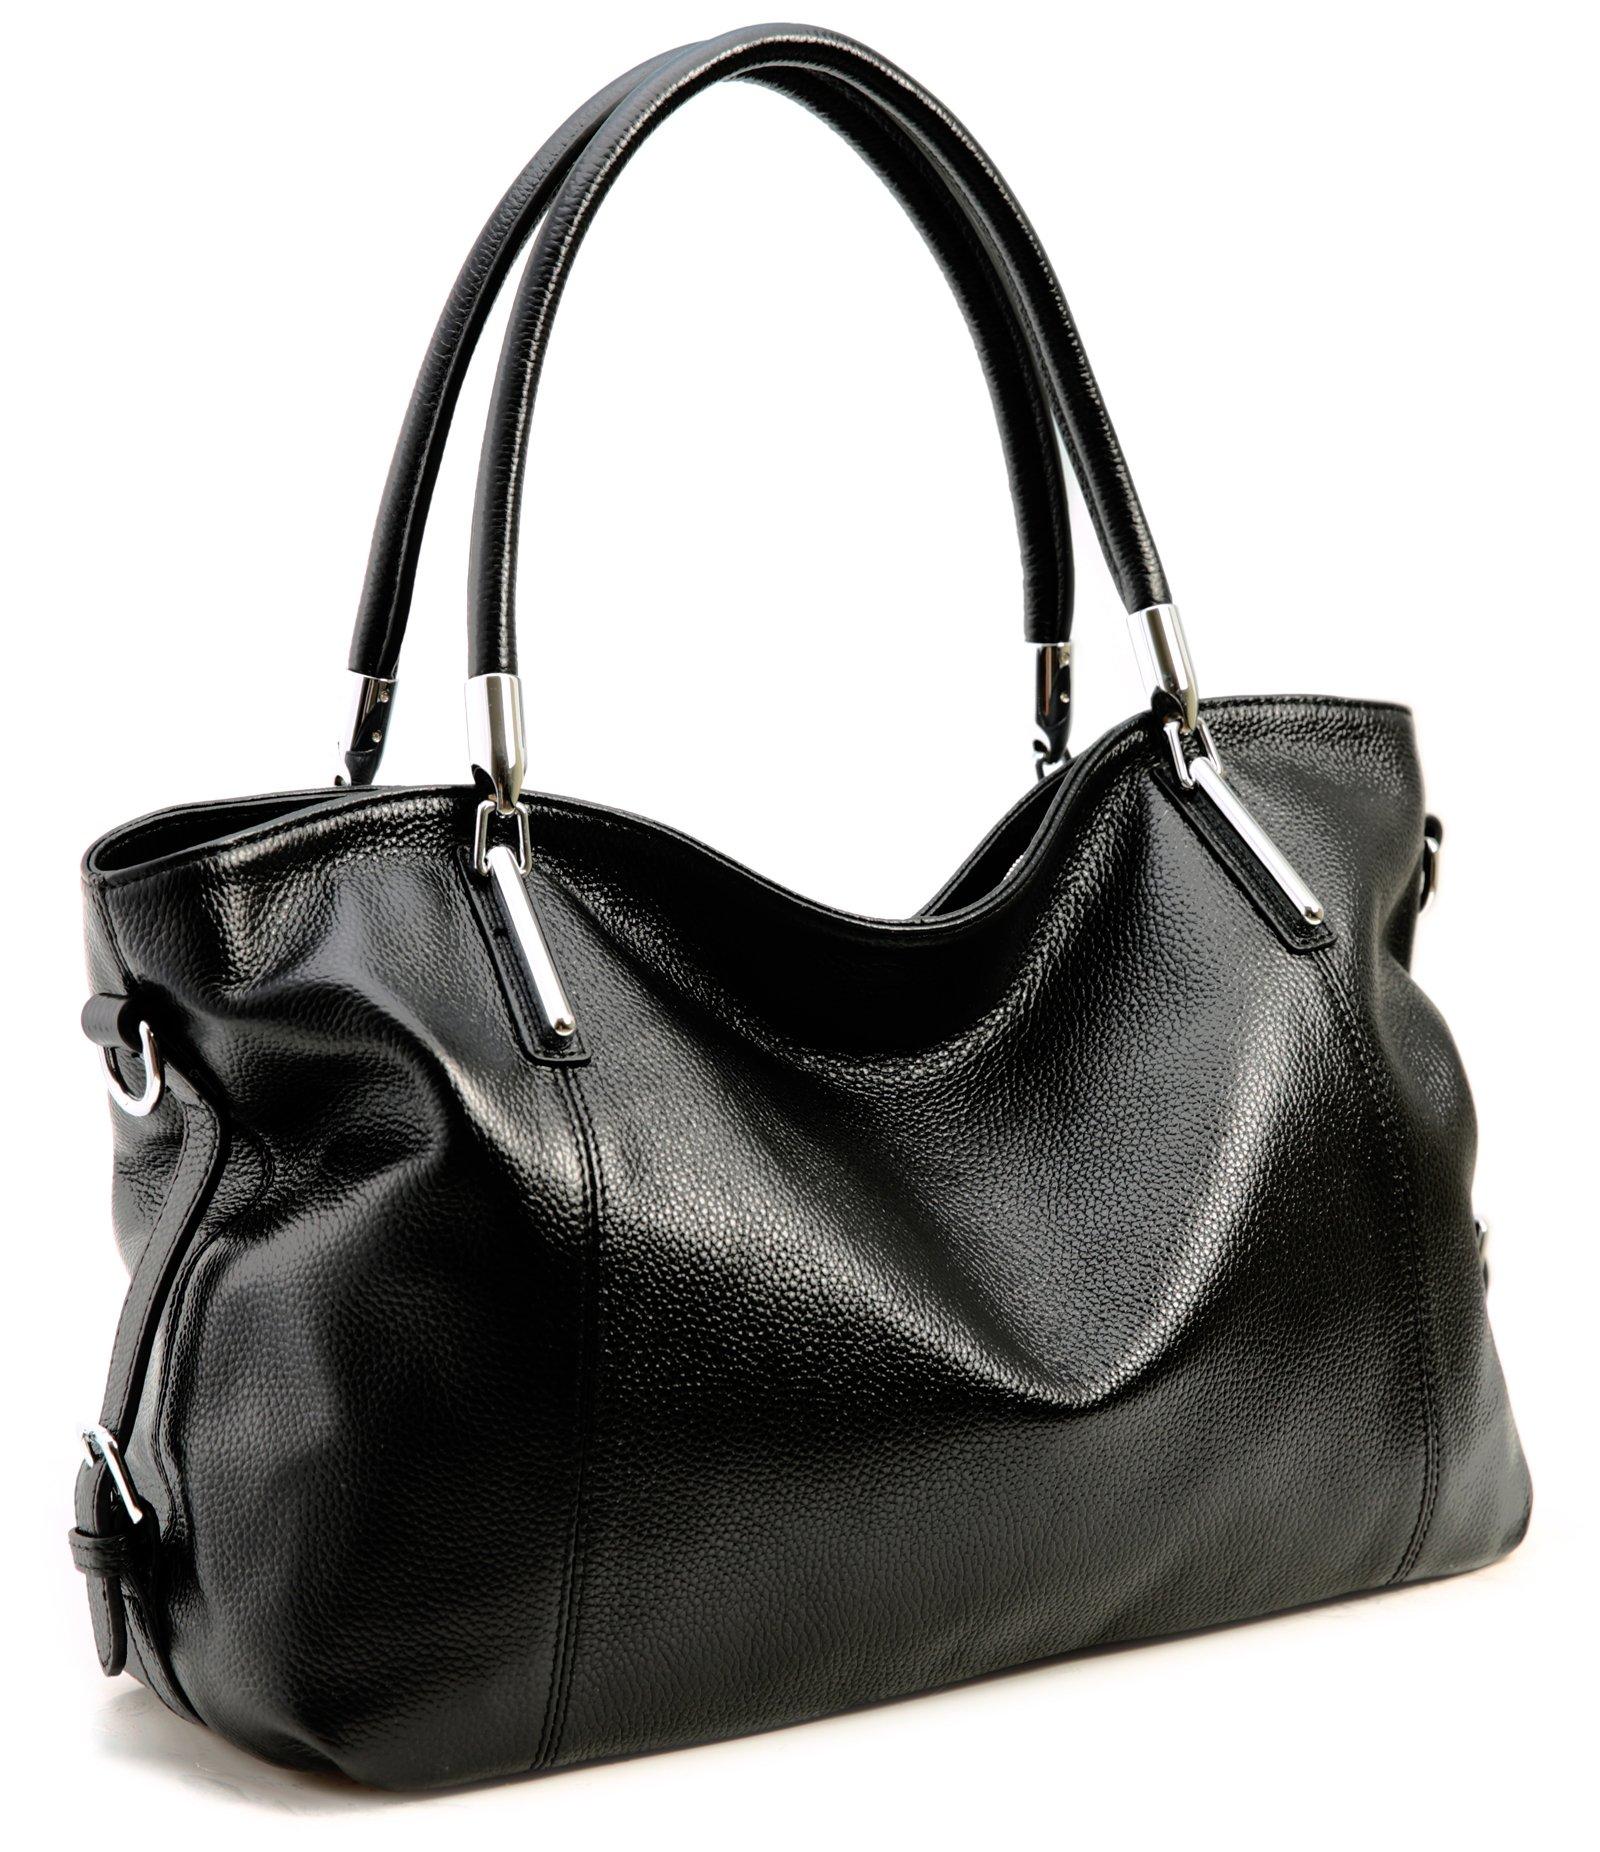 Iswee Women's Vintage Leather Tote Shoulder Bag Handbags Purse Satchels (Black)